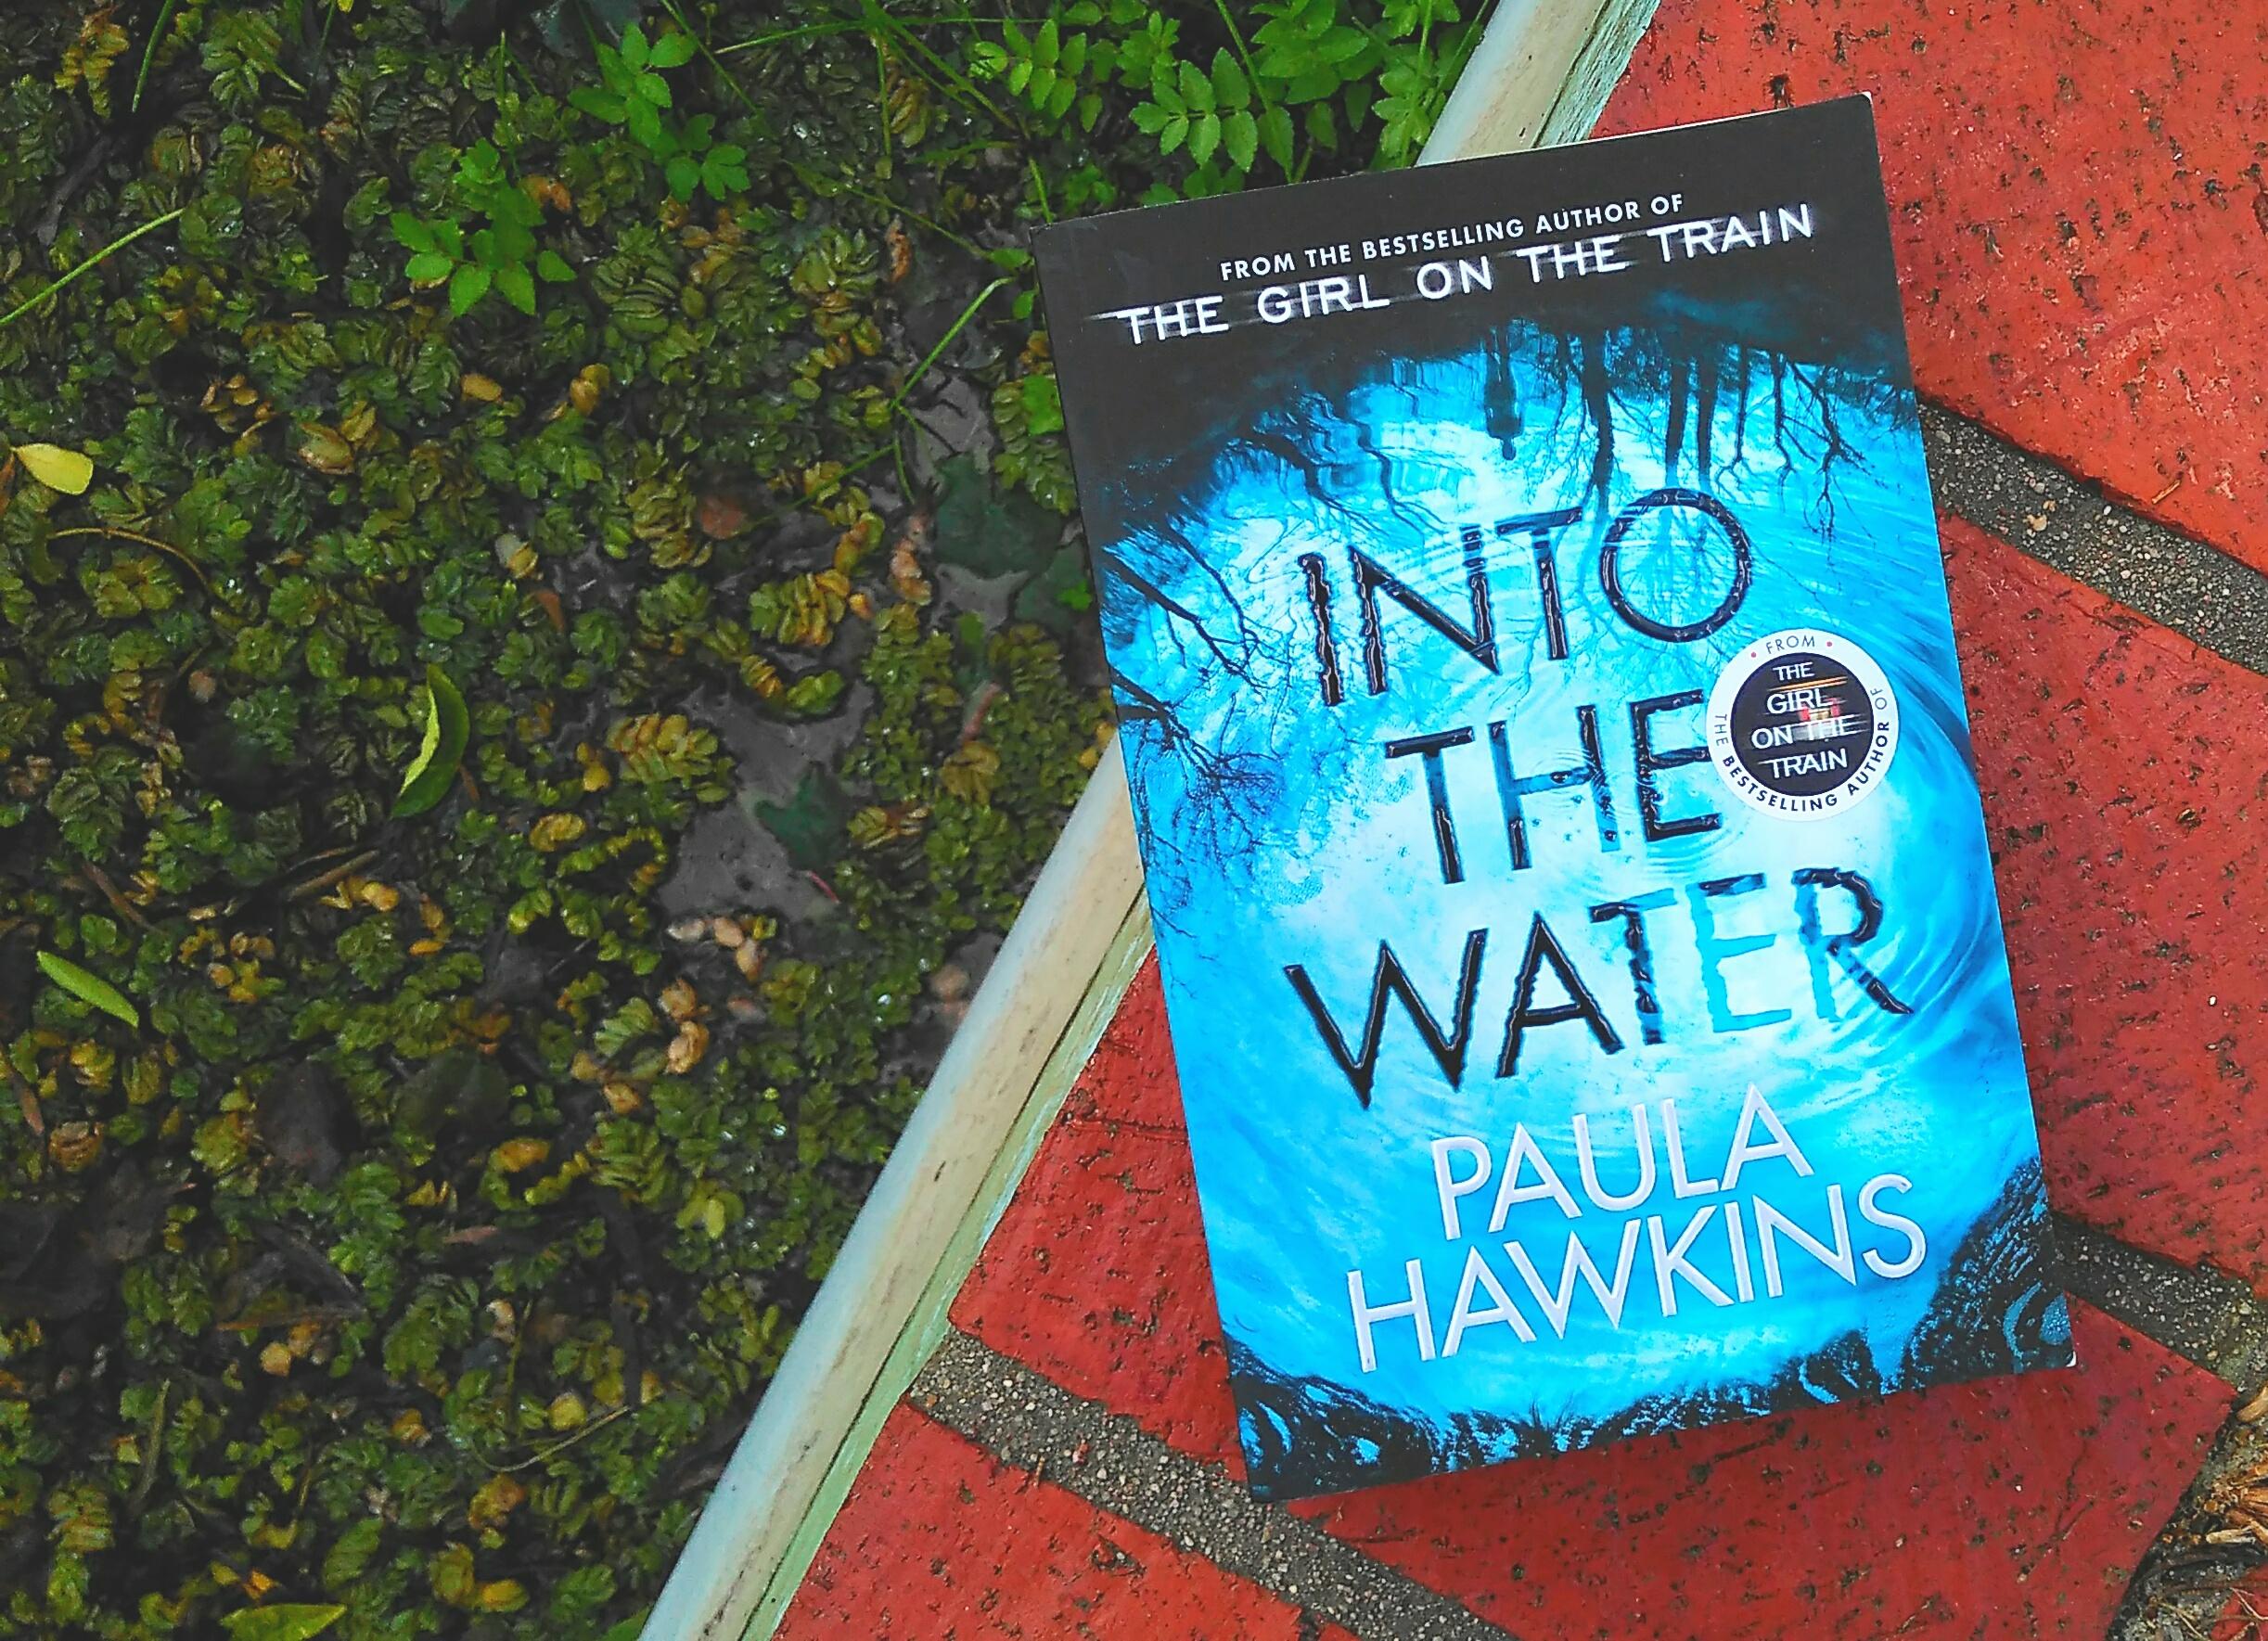 Into the water – Paula Hawkins